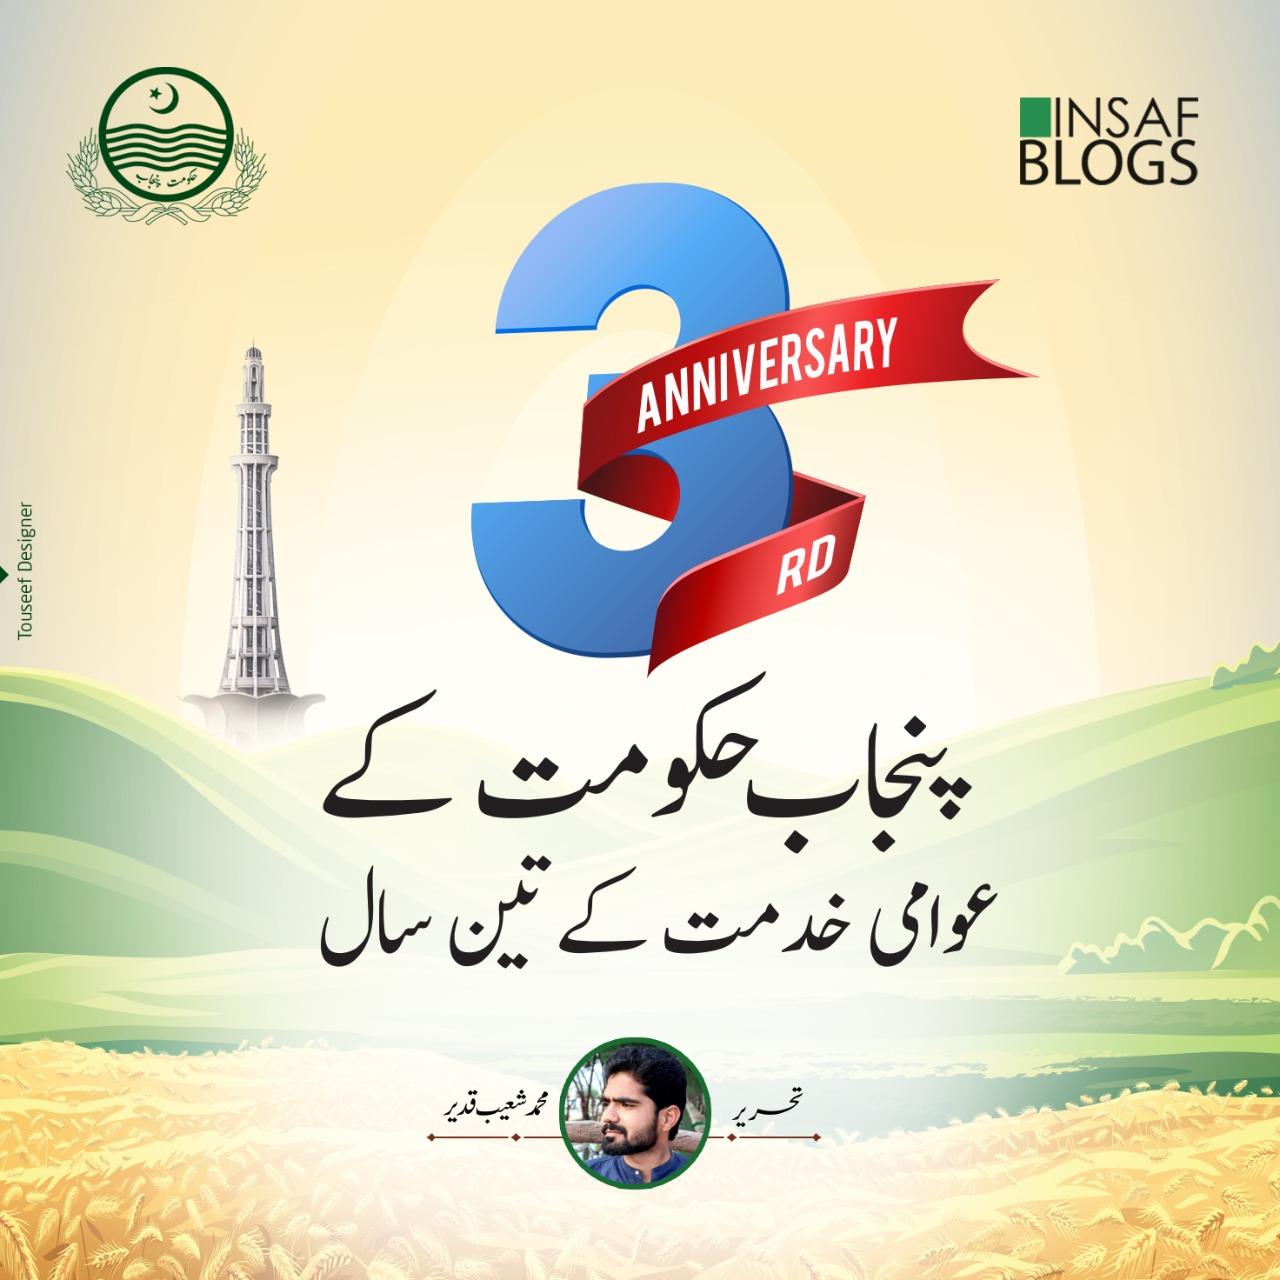 3 Successful Years of Punjab Govt Under CM Buzdar - Insaf Blog